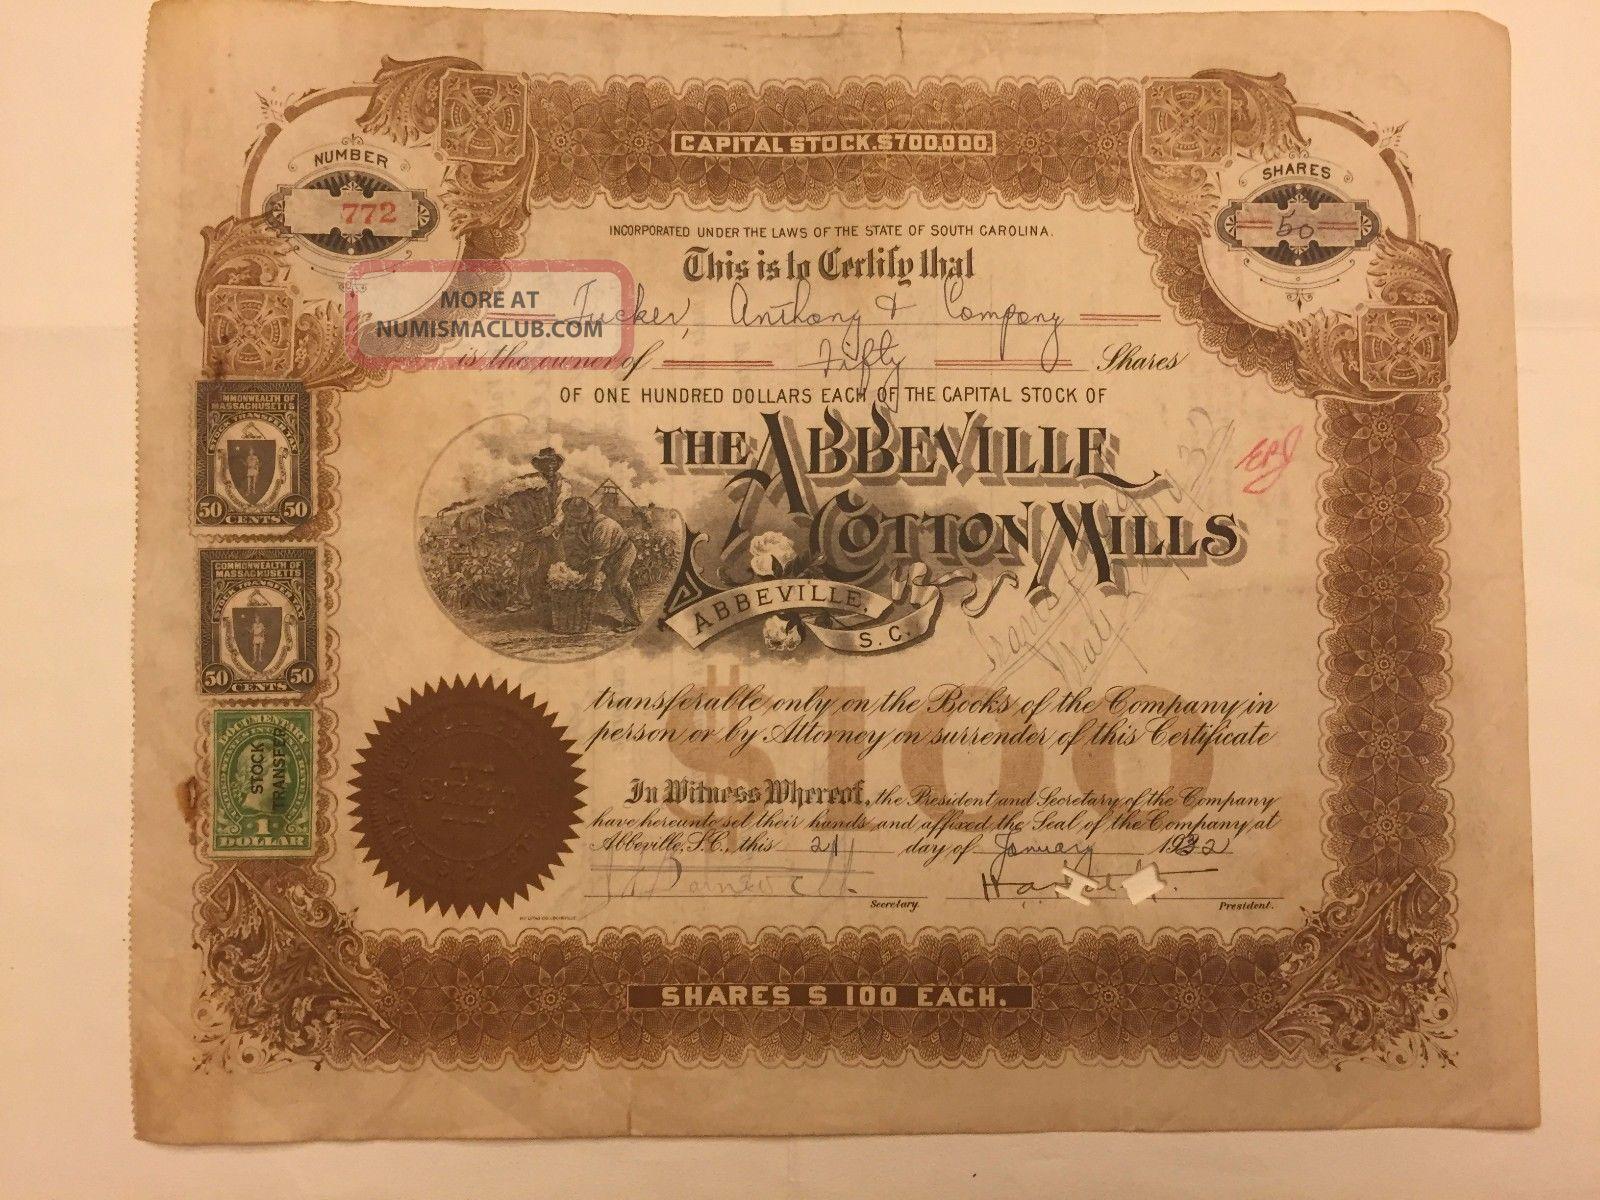 1932 Abbeville Cotton Mills Stock 29 South Carolina Doc.  Stamps Rare Slave Vig Stocks & Bonds, Scripophily photo